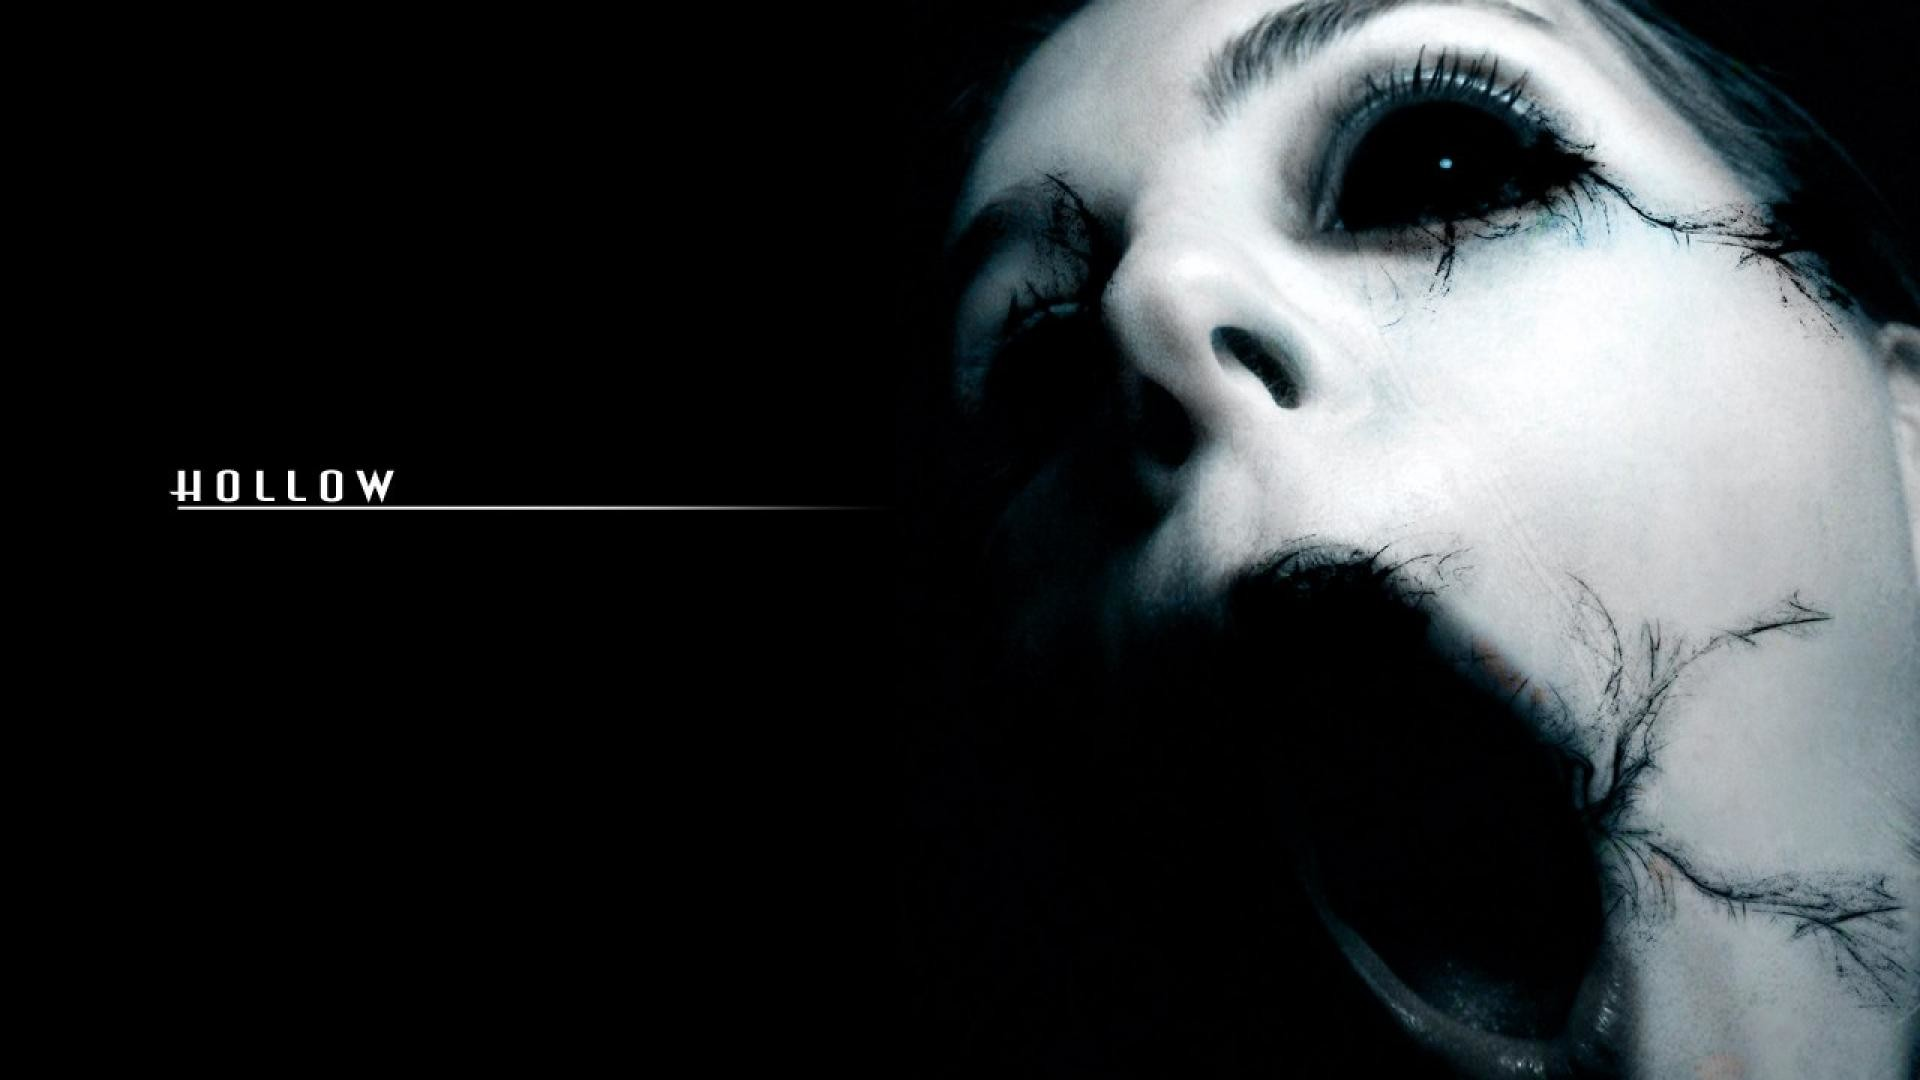 Creepy Hd Wallpaper: Scary HD Wallpaper (61+ Images